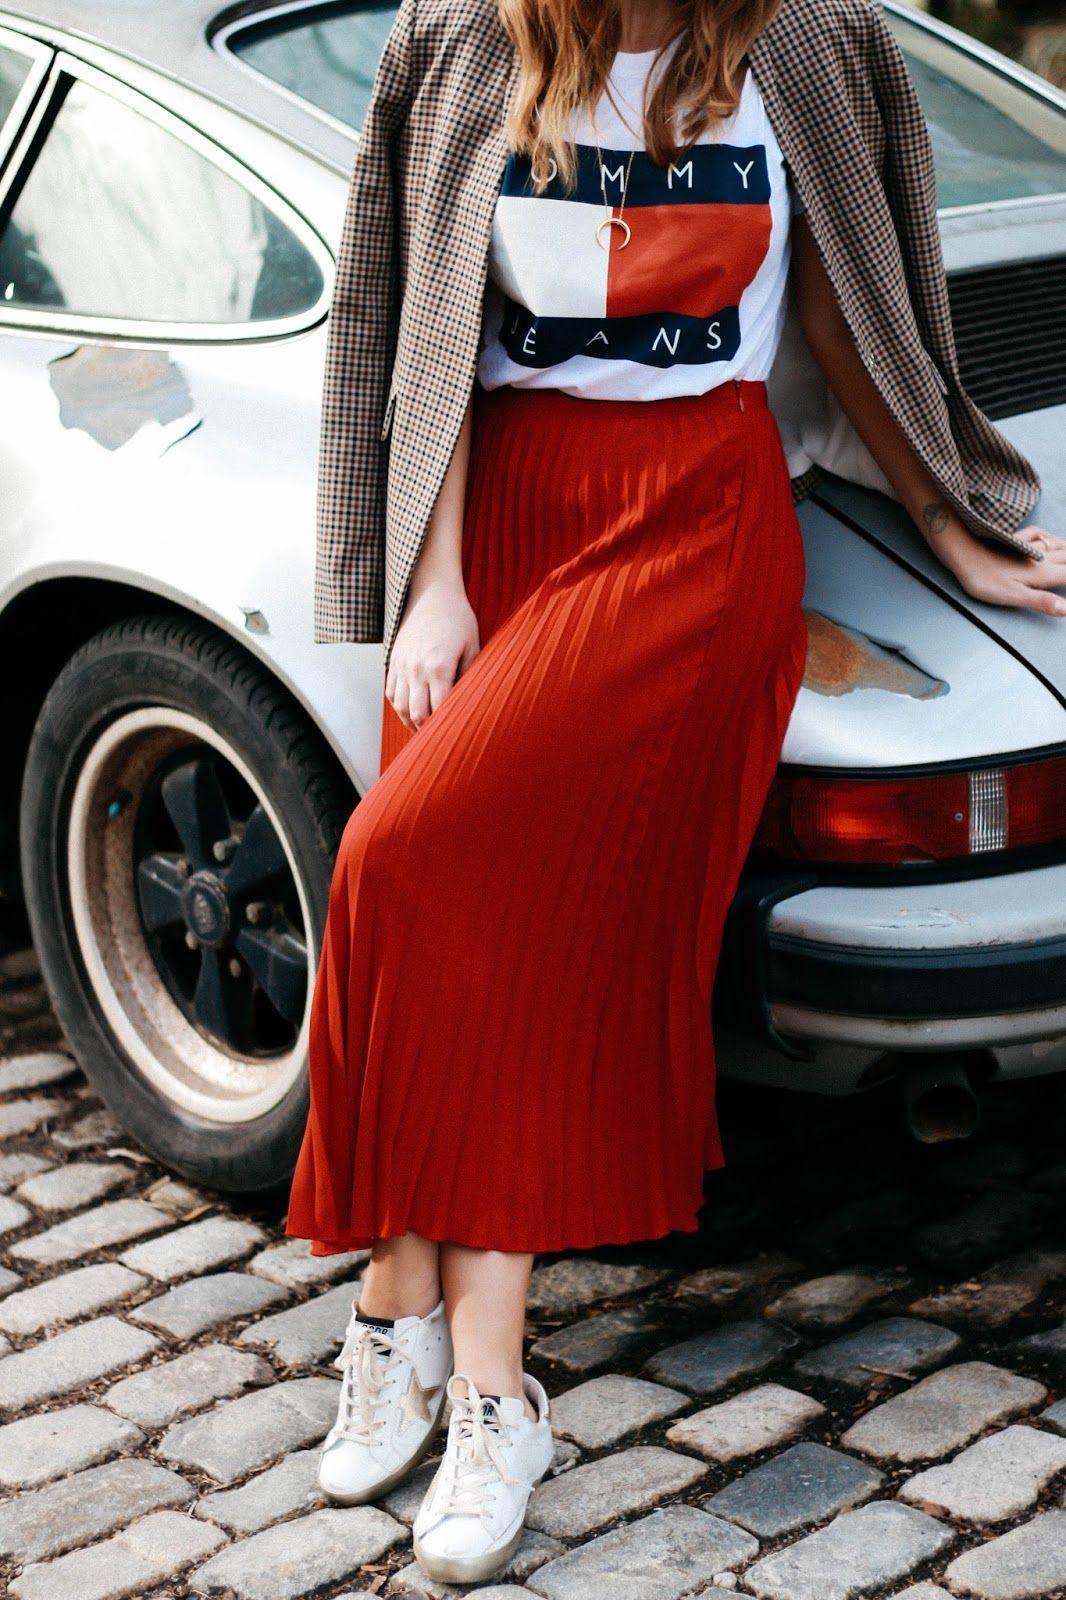 87dd7a538 Red Pleated Skirt   Outfit #2.   Faldas rojas, Faldas con zapatillas ...